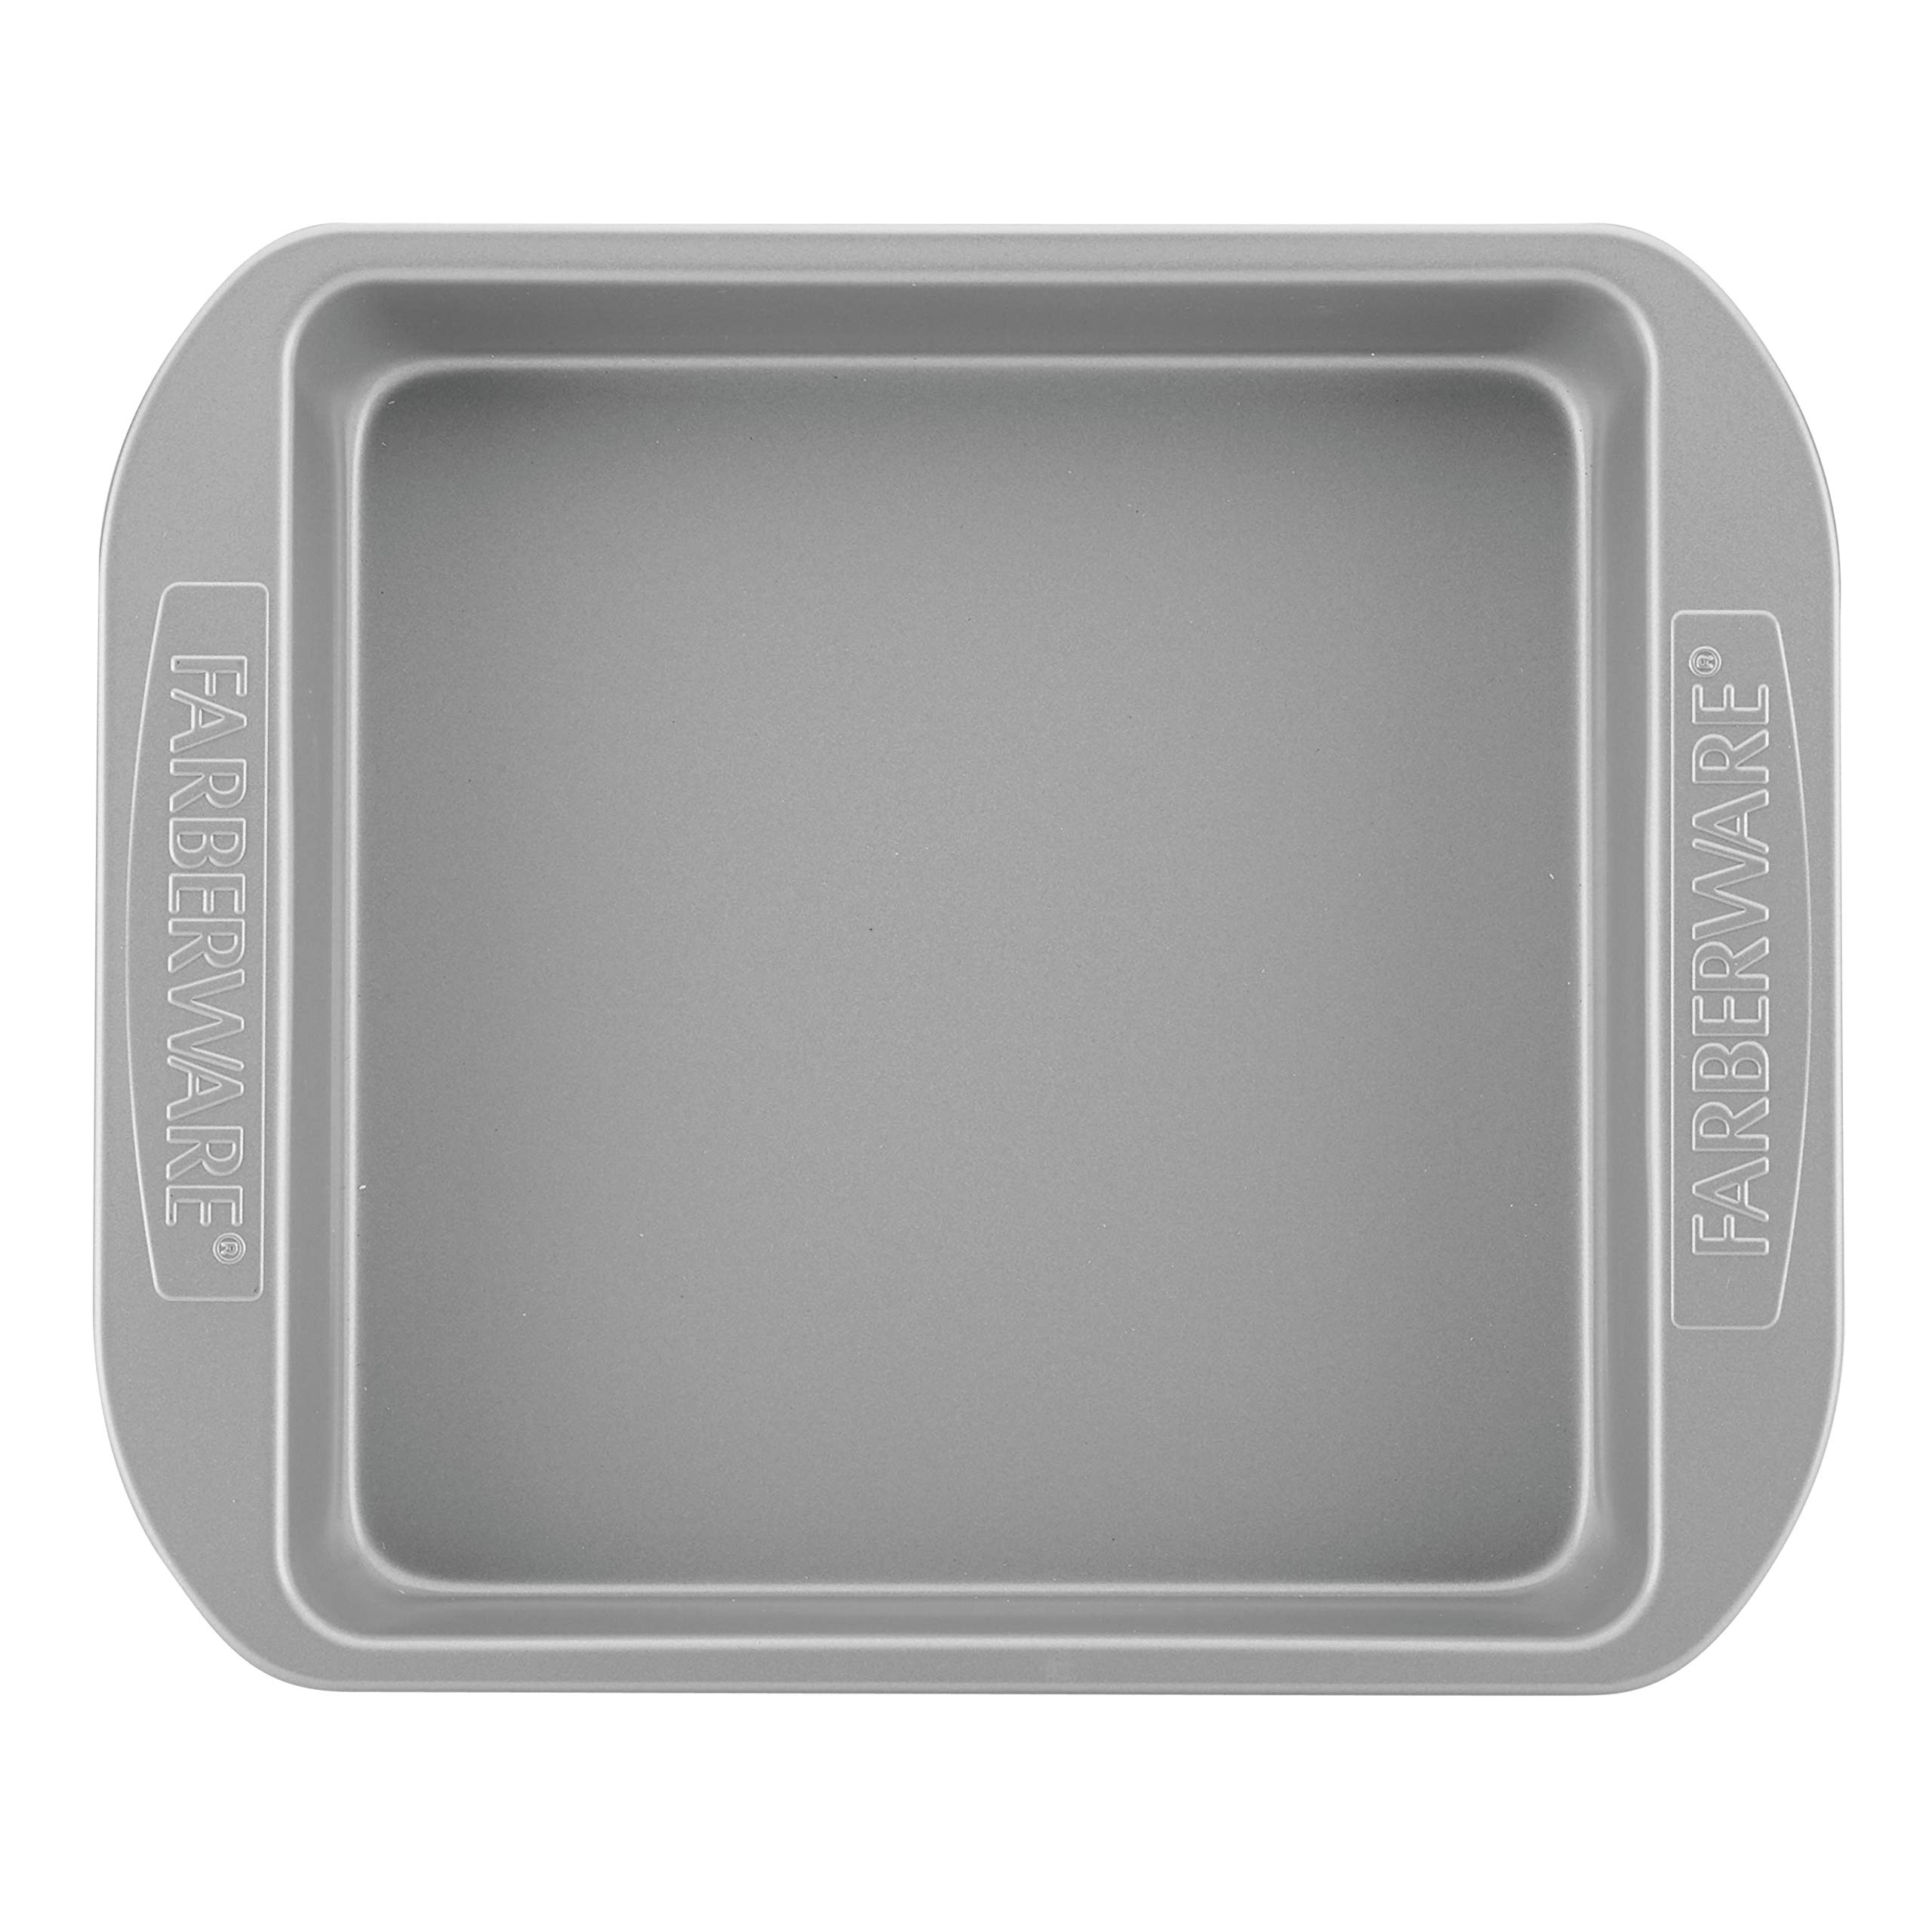 Farberware 47744 2-Piece Rectangular Set Steel Cake Pan, Gray by Farberware (Image #2)